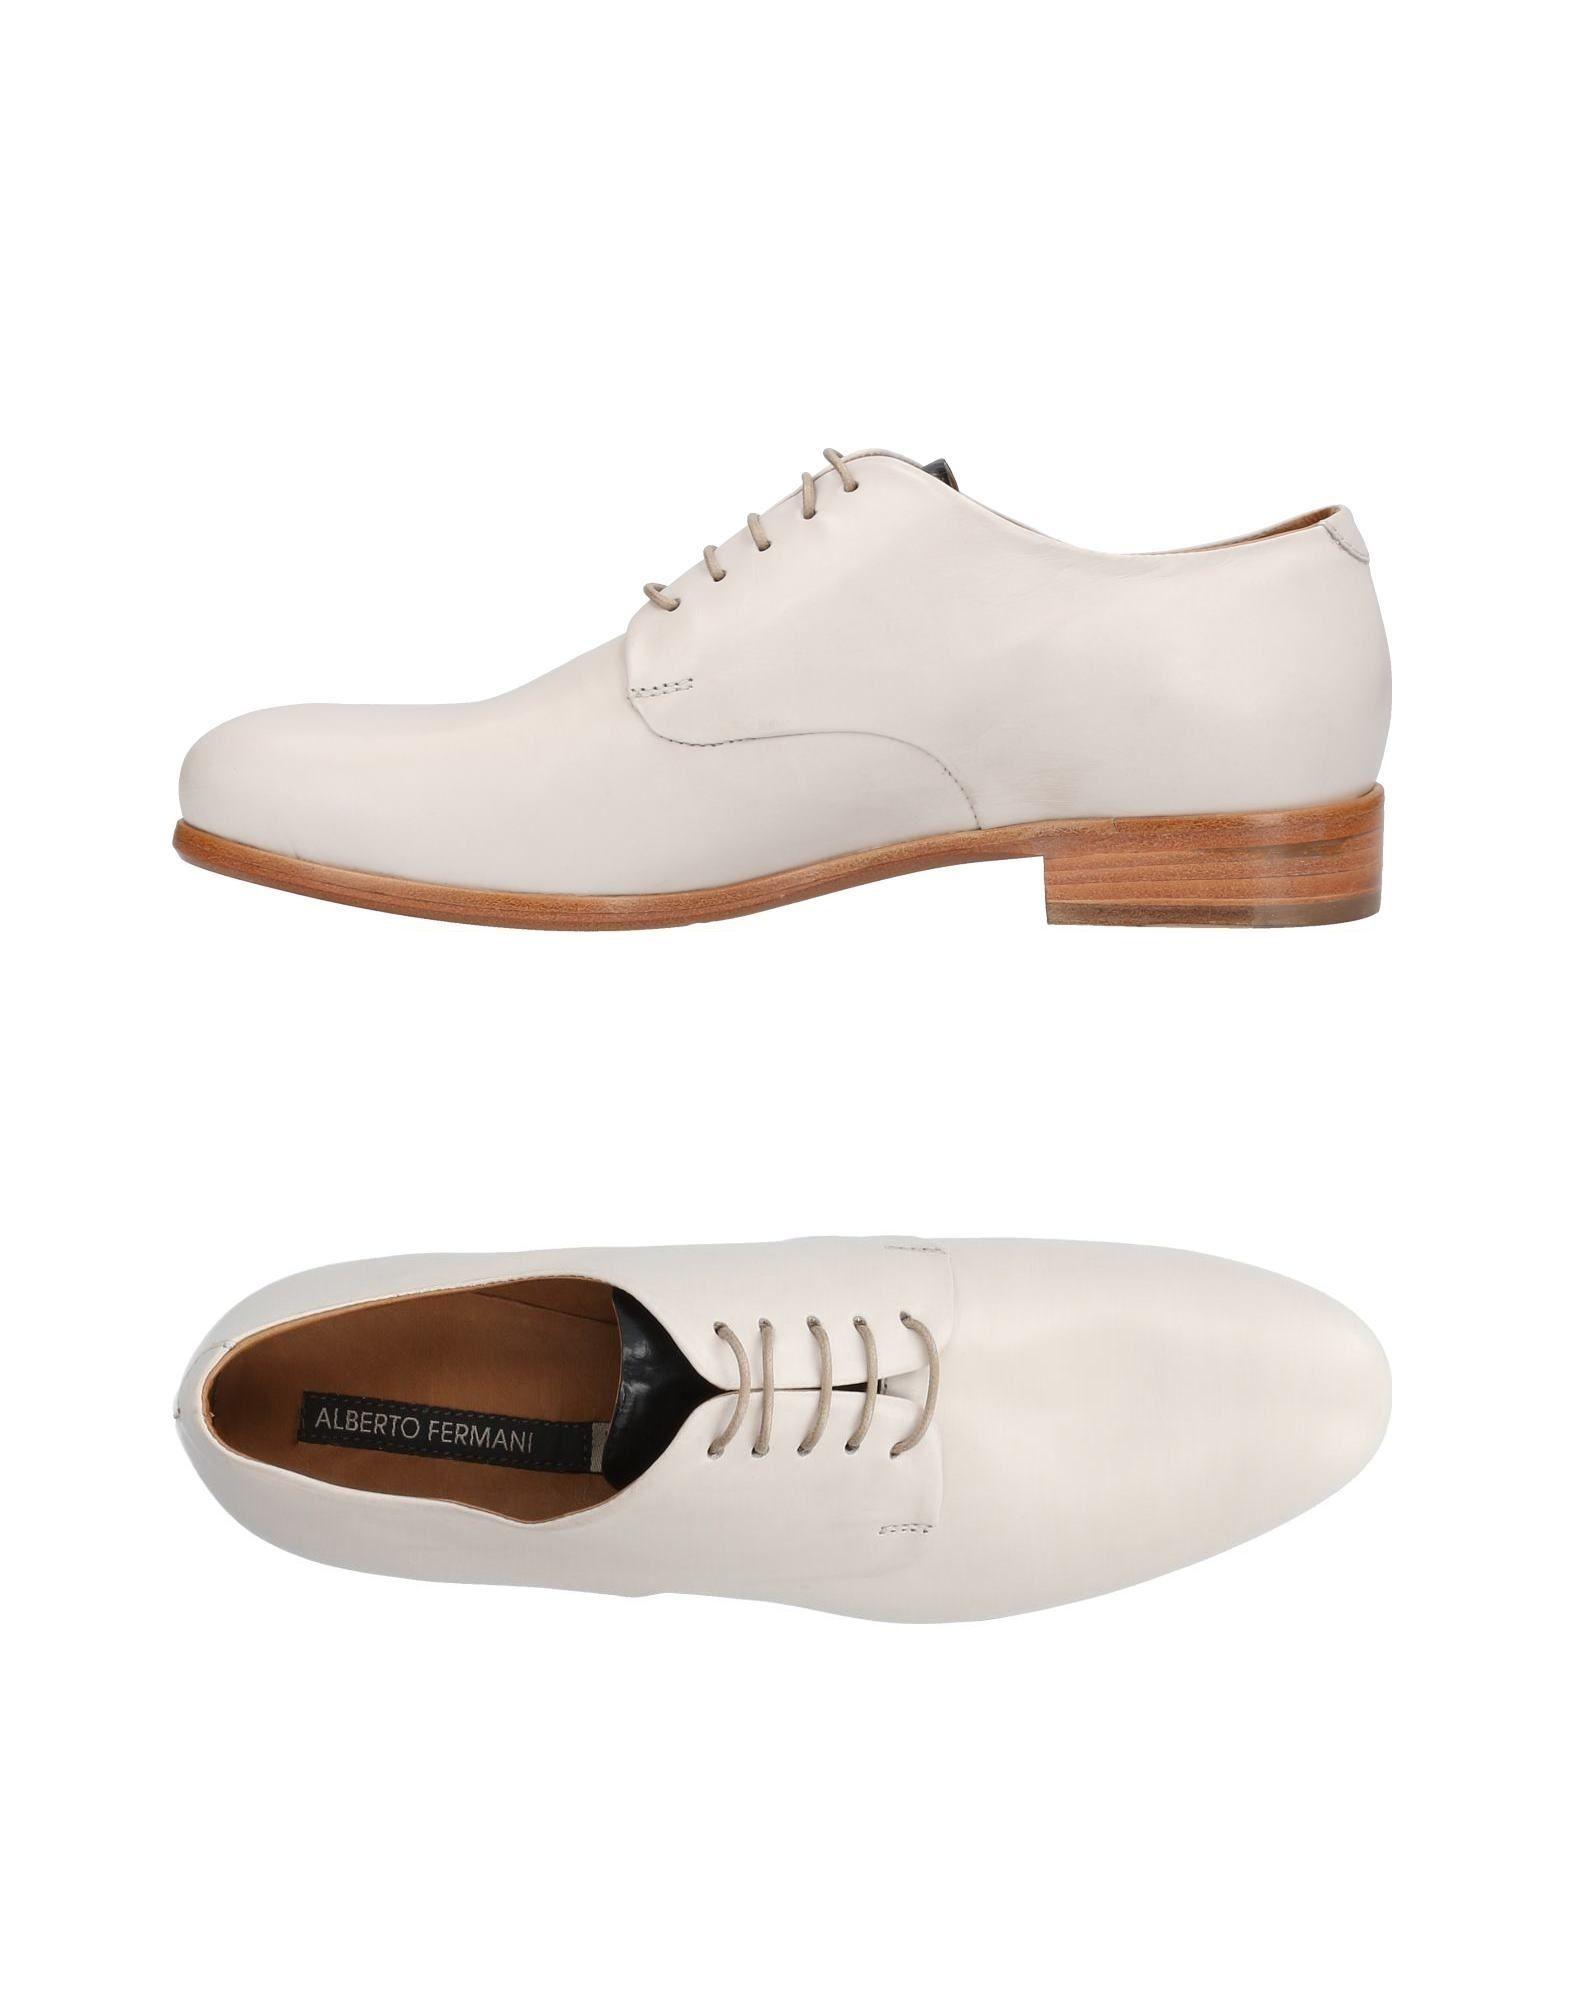 1a53681bee3 Alberto Fermani Laced Shoes - Women Alberto Fermani Laced Shoes ...